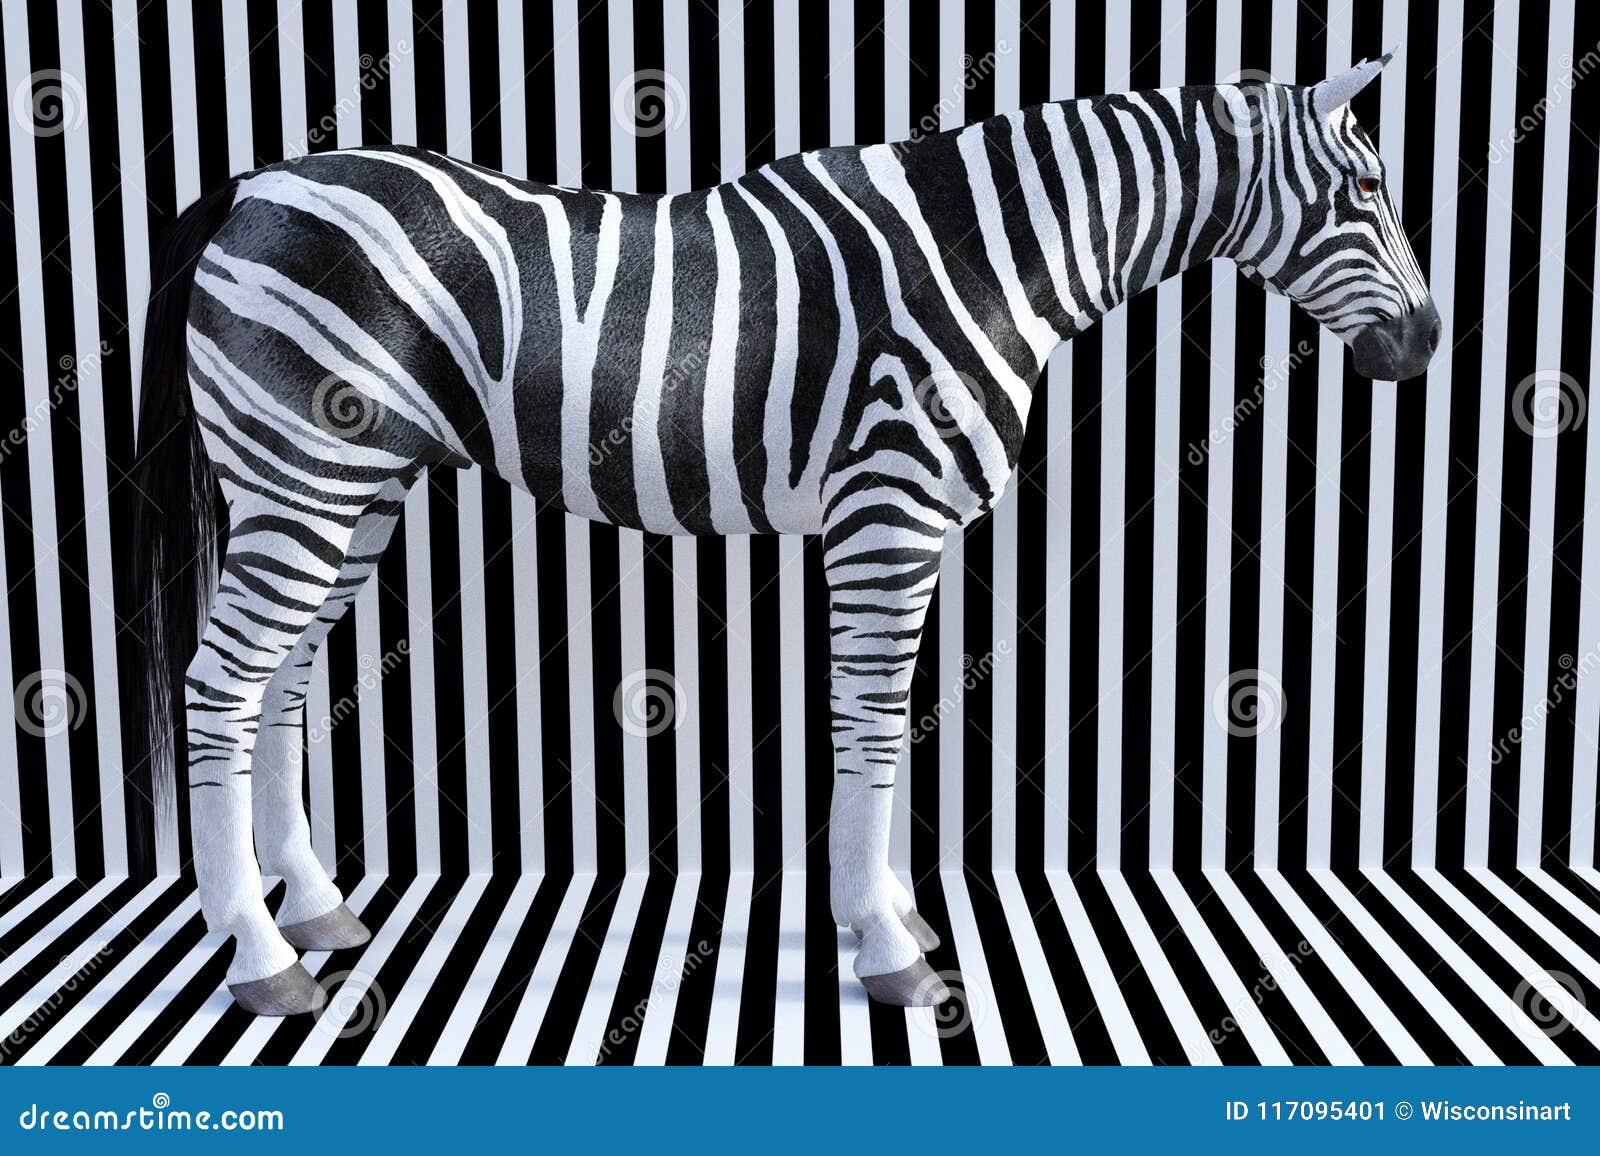 Surreal Zebra Stripes Wildlife Animal Nature Stock Image